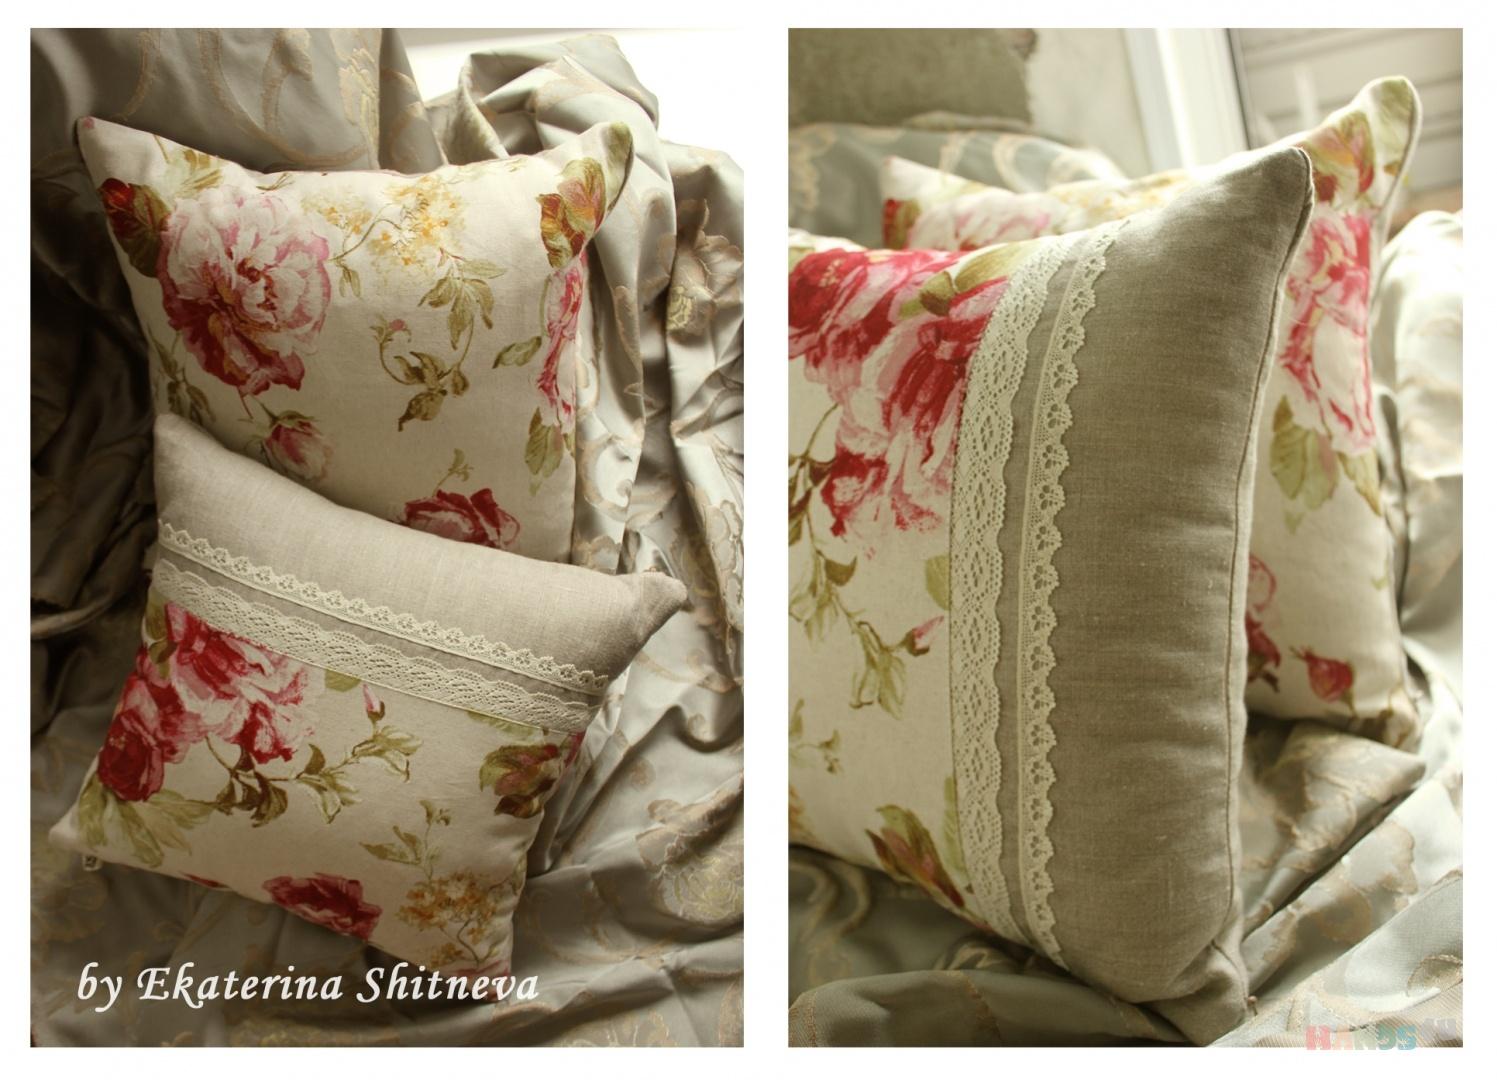 Сшить наволочку на диванную подушку